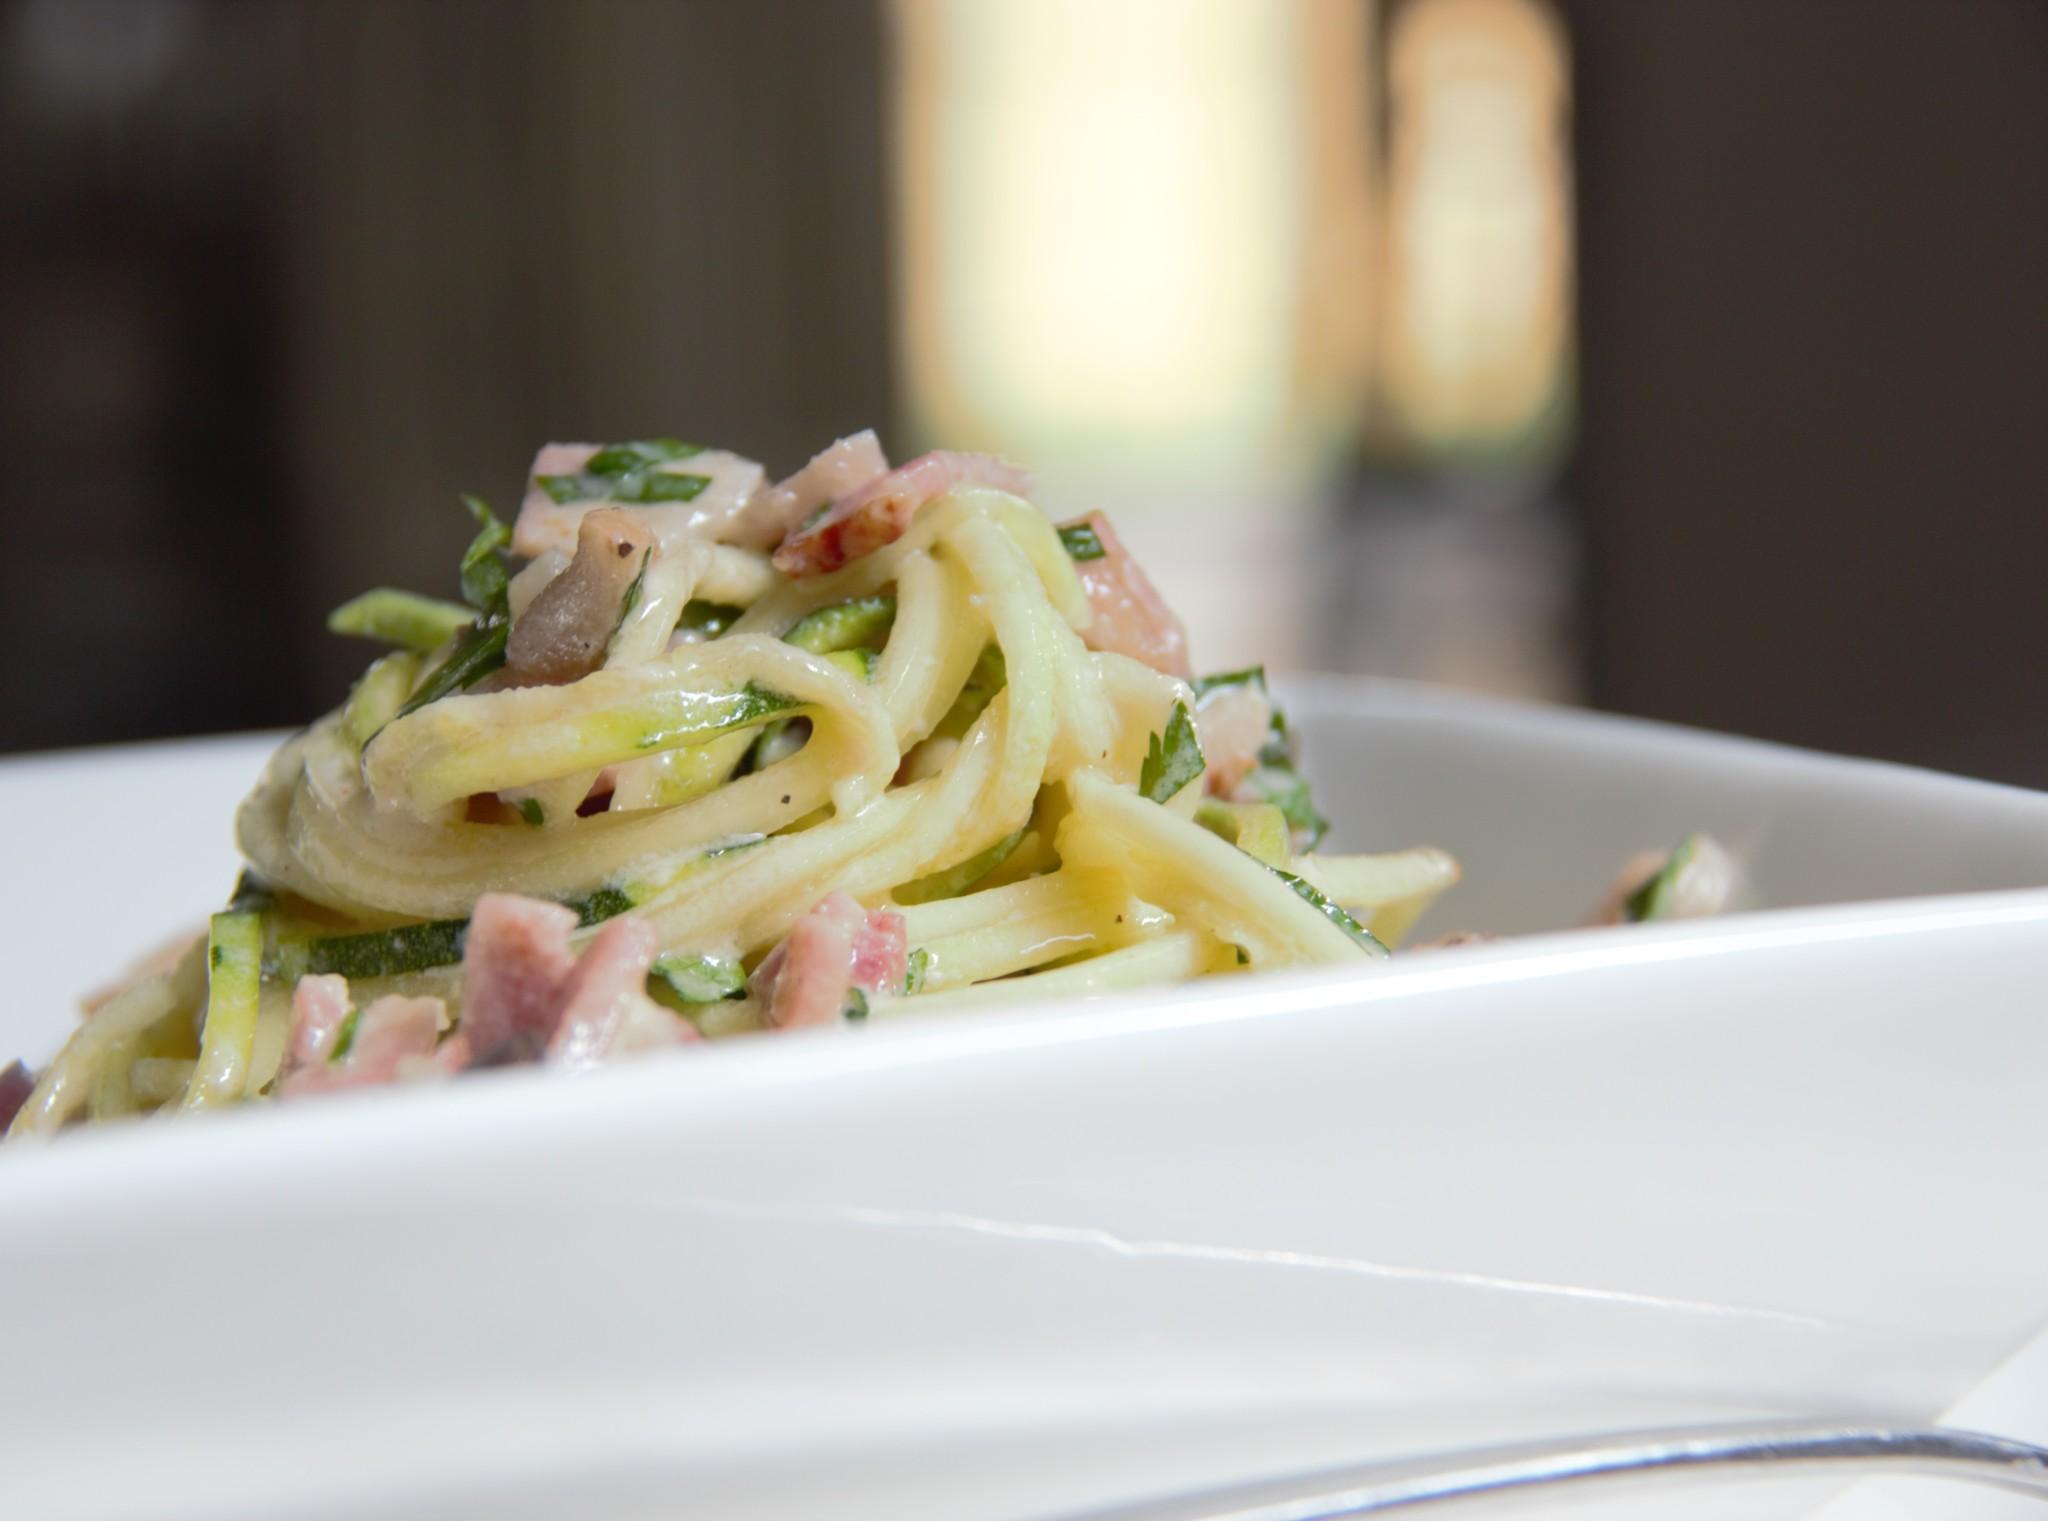 Spaghetti Carbonara (Paleo, Grain-Free)